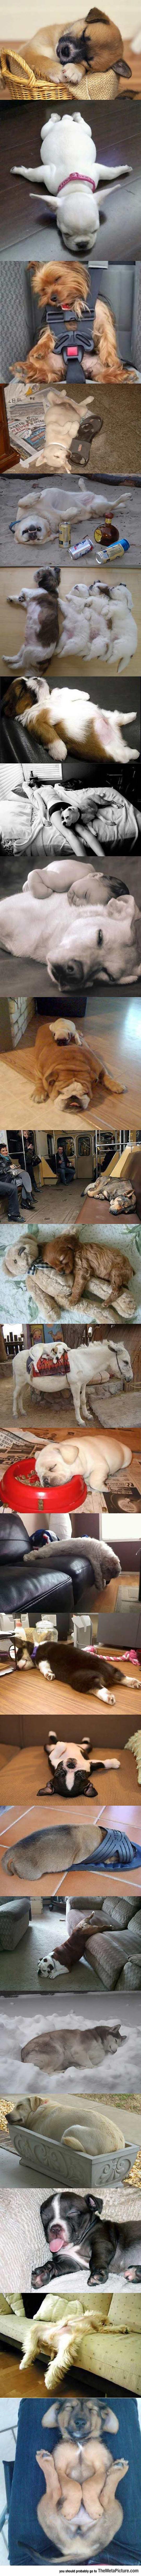 cool-dogs-asleep-floor-puppies-cute